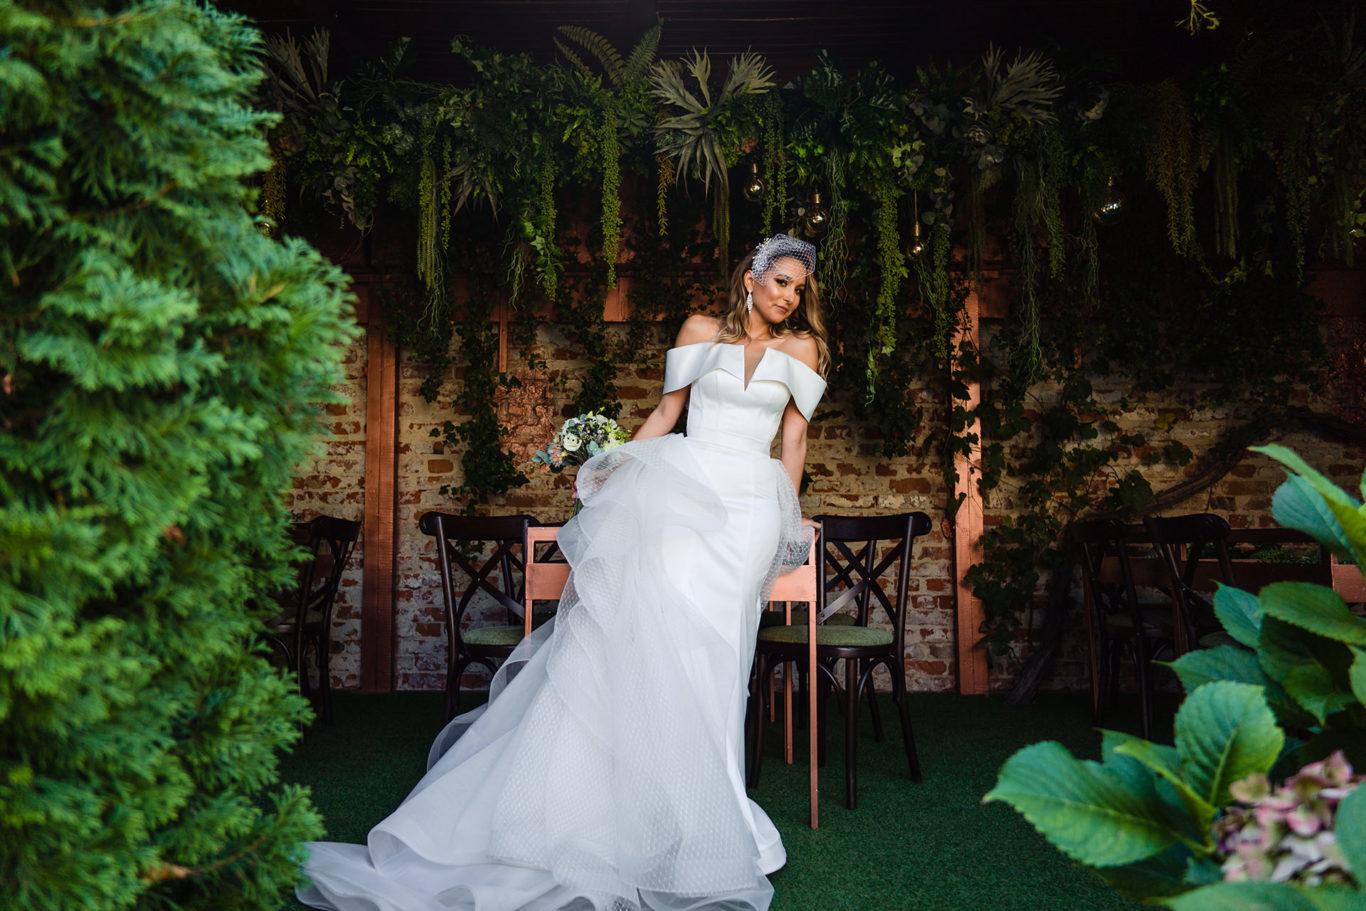 Ceremonie nunta la Atelier Florens - fotograf Ciprian Dumitrescu